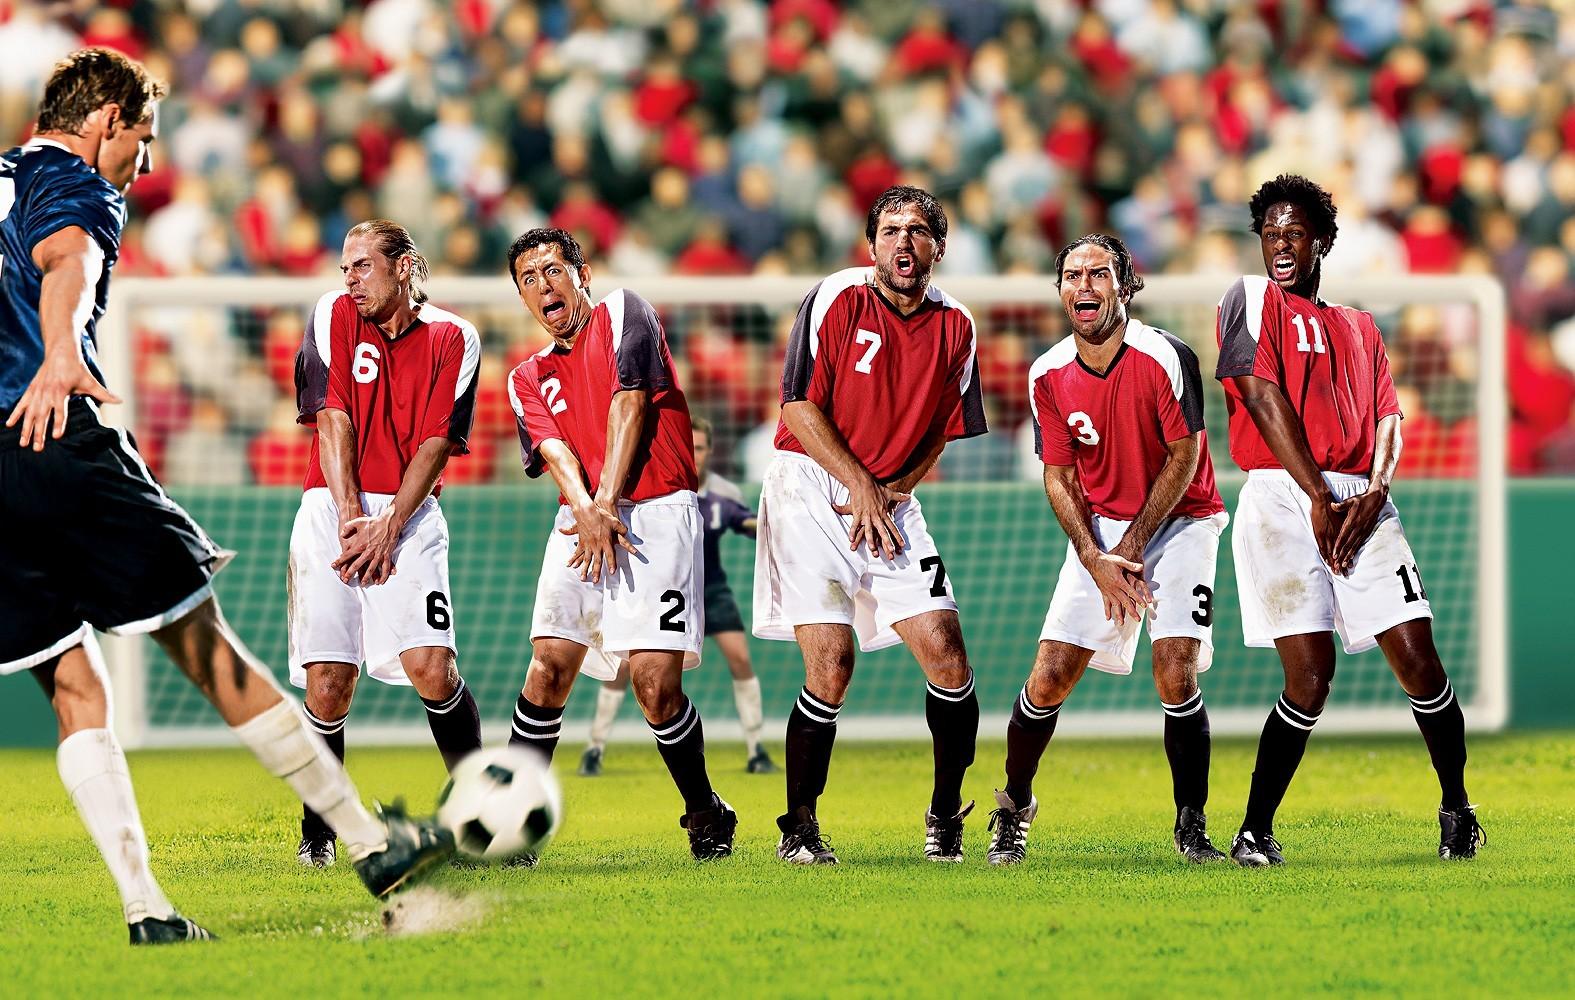 soccer-funny_00365680.jpg